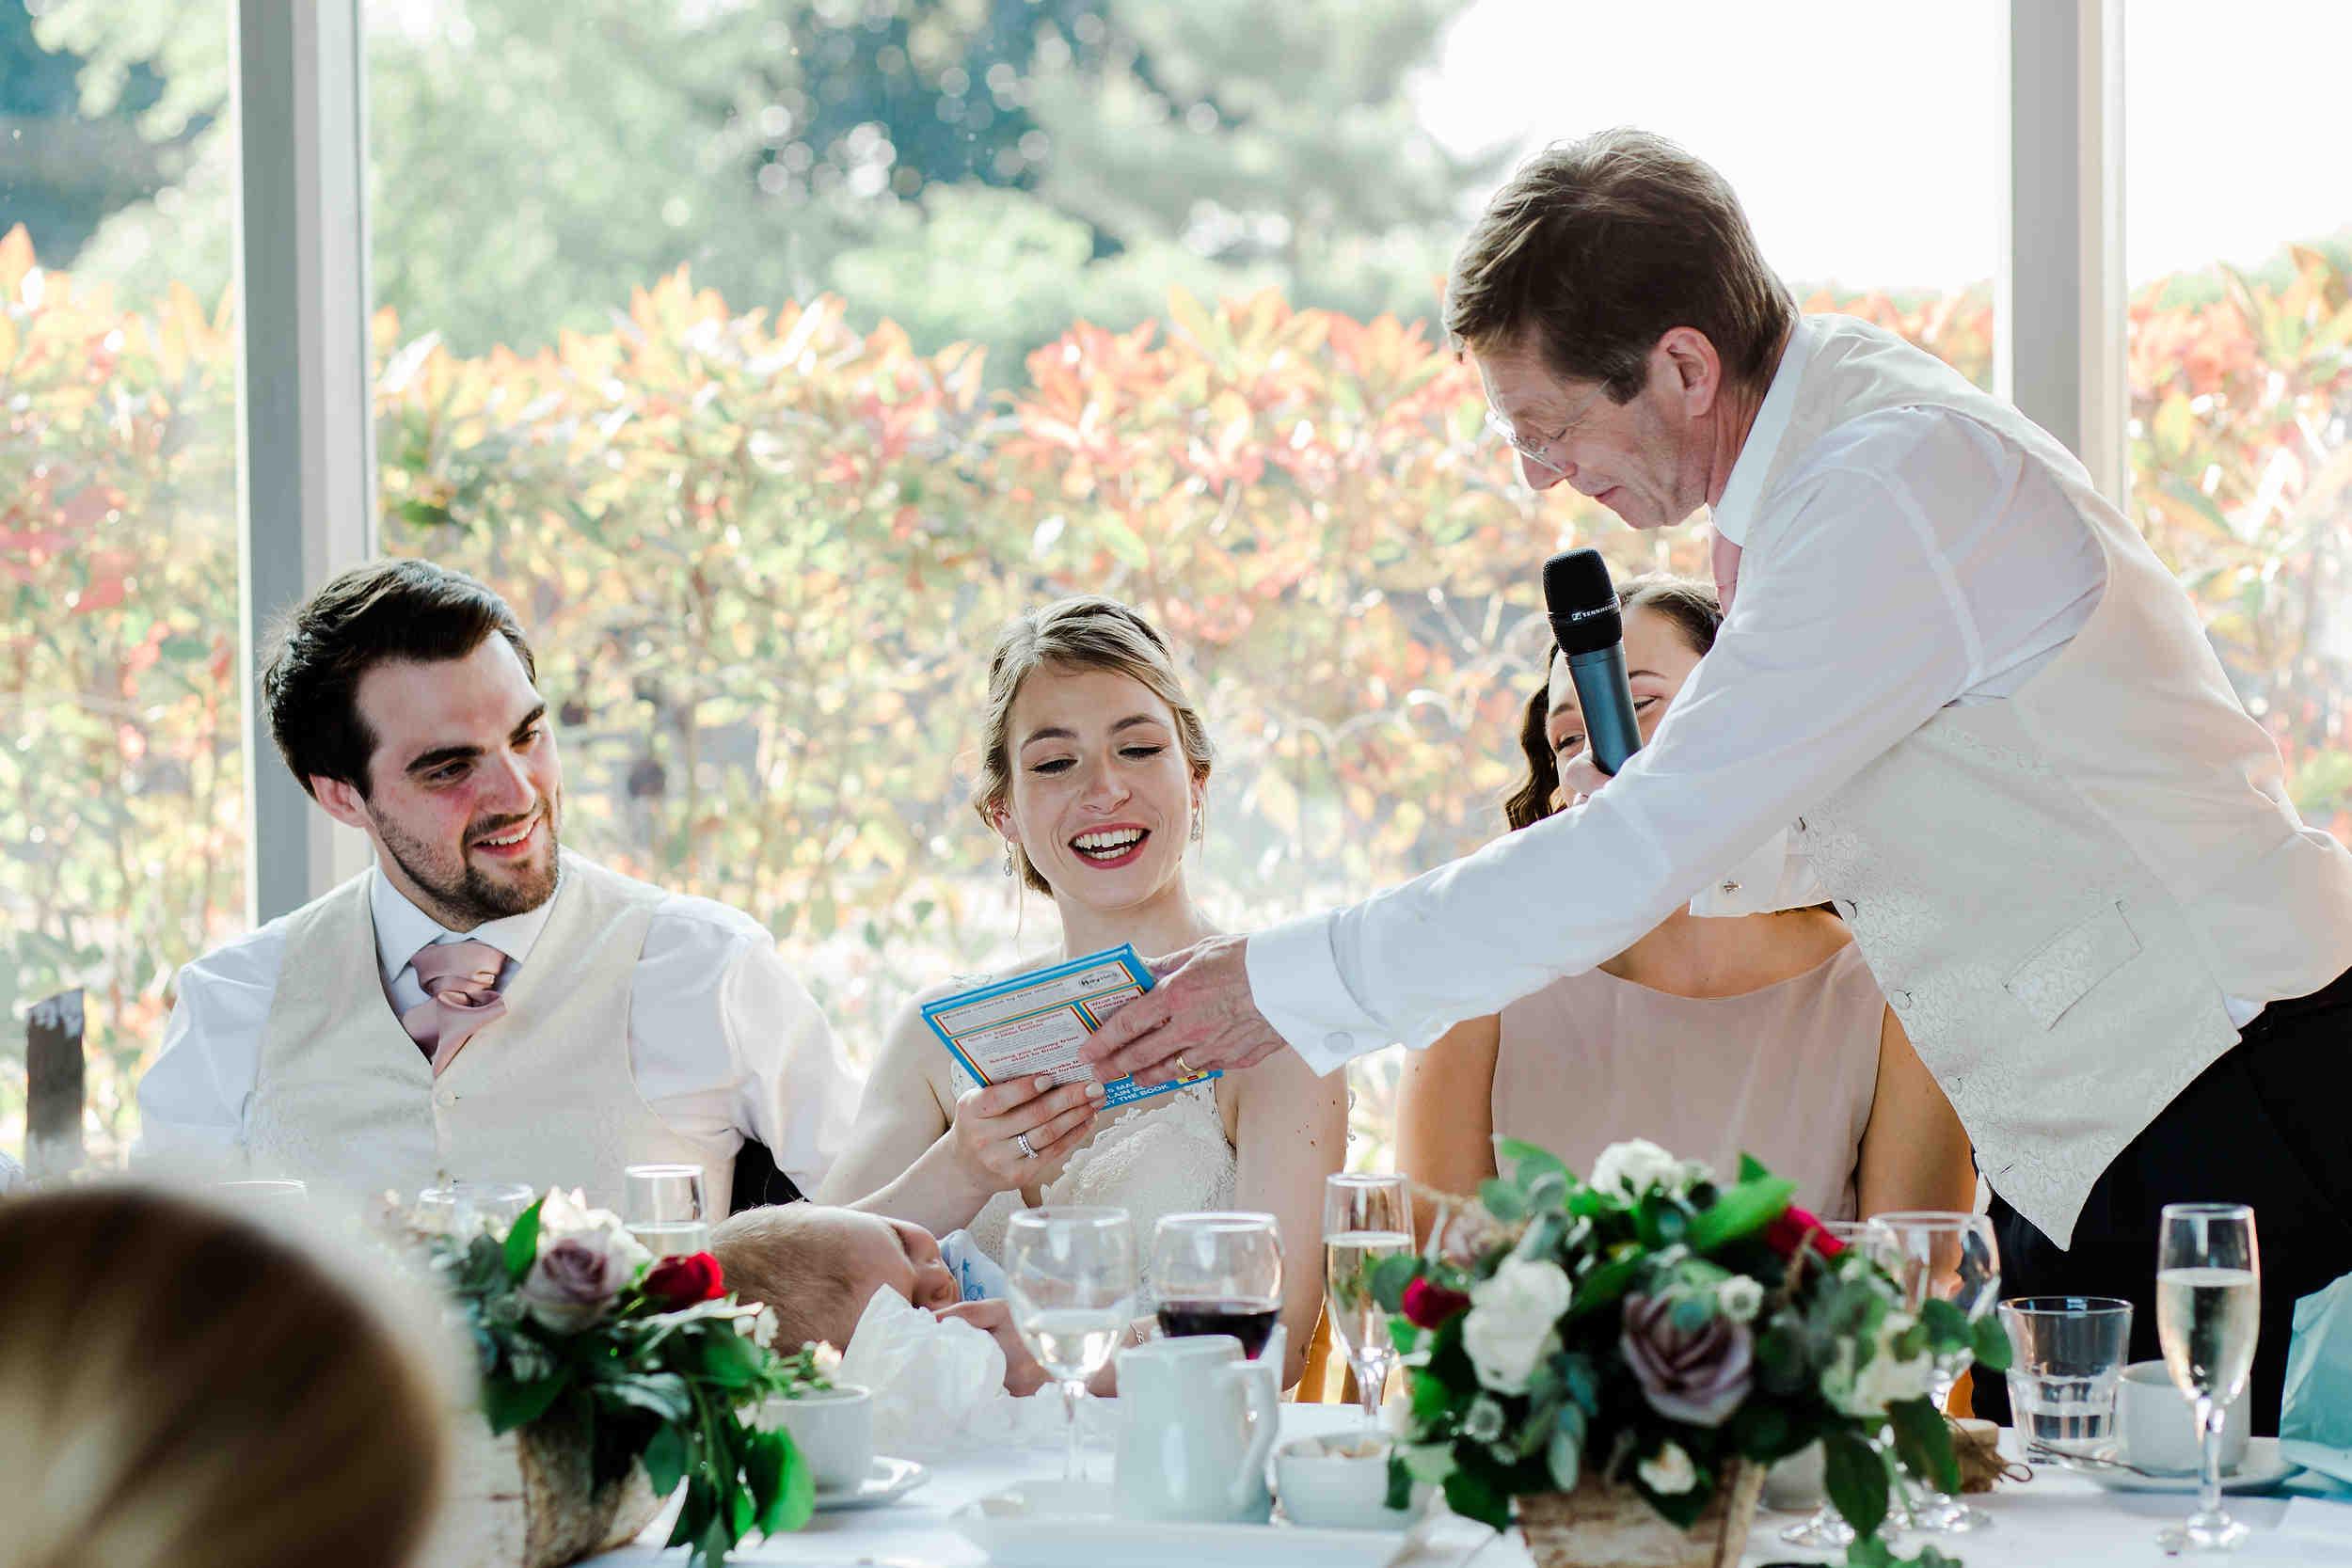 Modern_Stylish_Wedding_at_Swallows_Nest_Barn1250